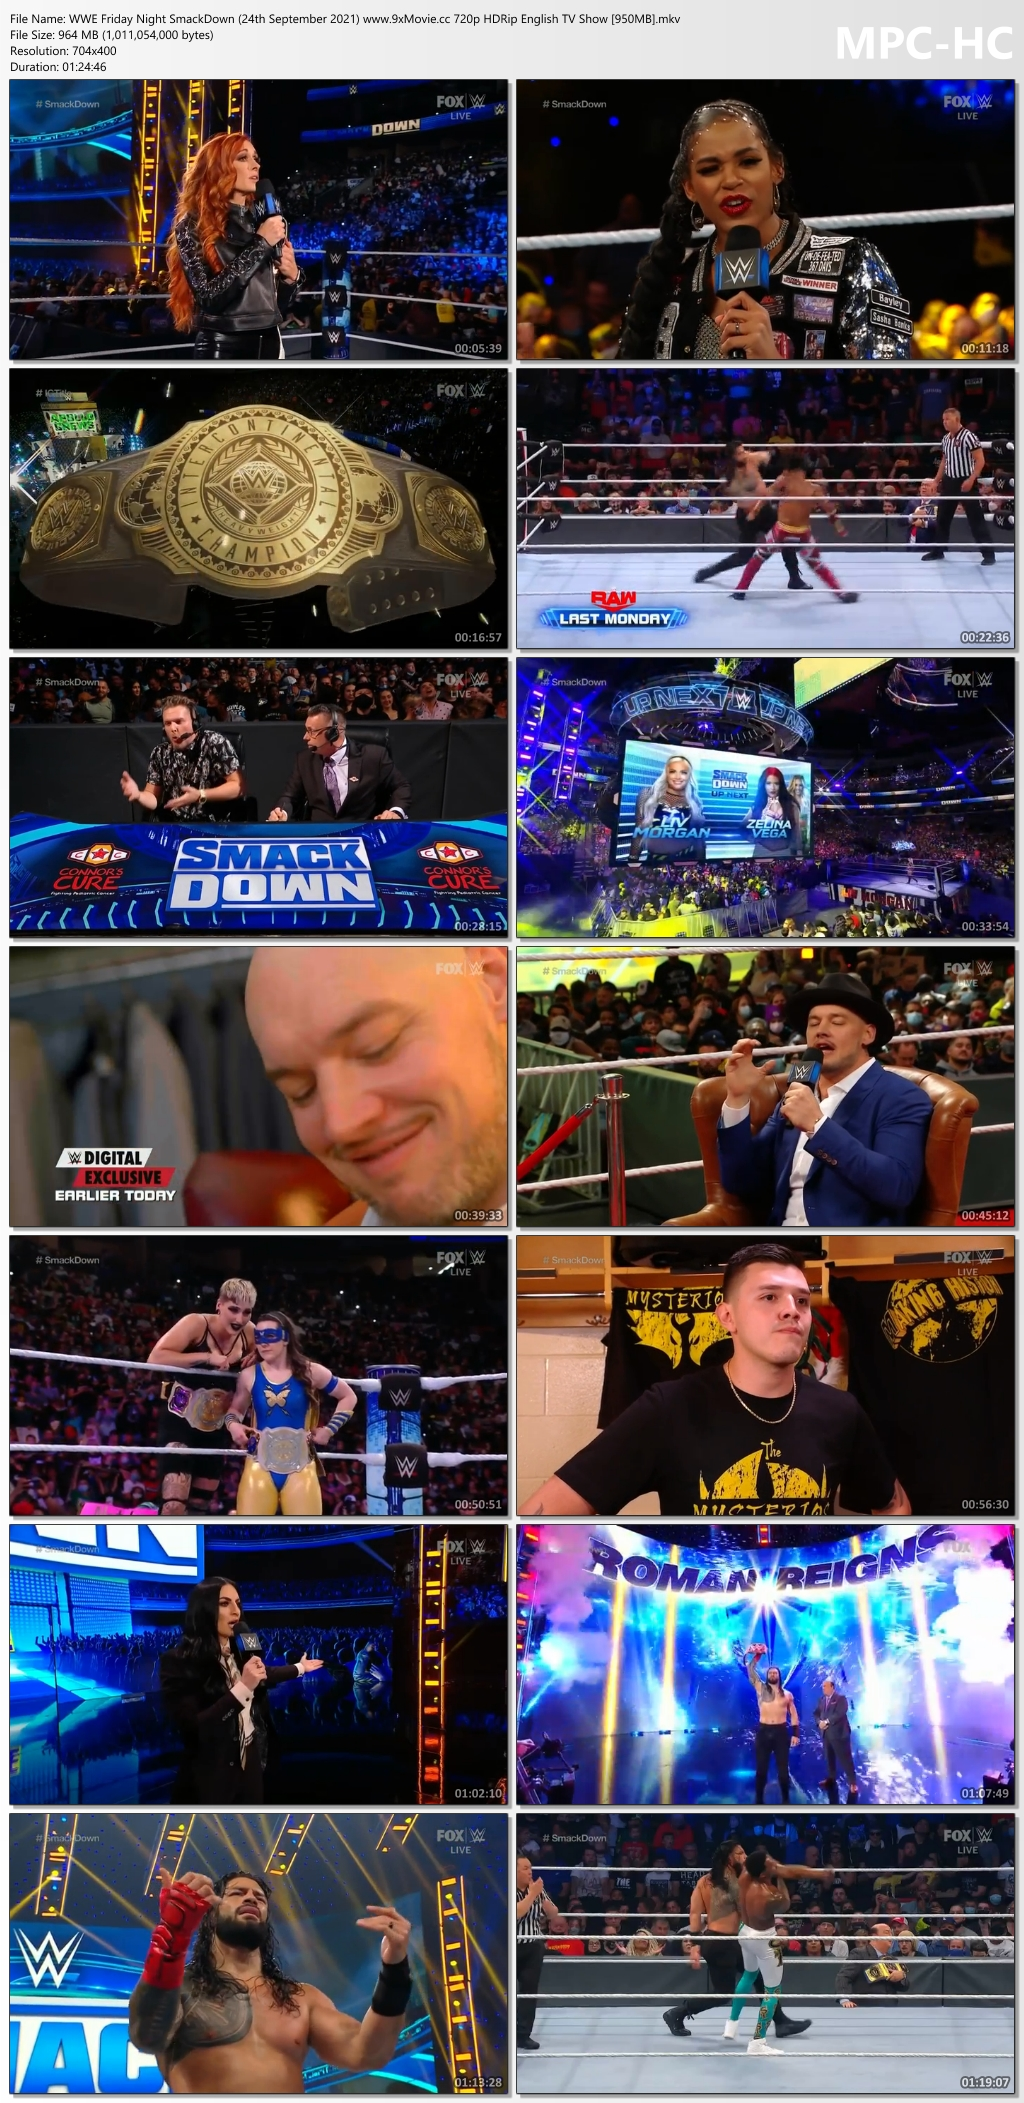 WWE-Friday-Night-Smack-Down-24th-September-2021-www-9x-Movie-cc-720p-HDRip-English-TV-Show-950-MB-mk